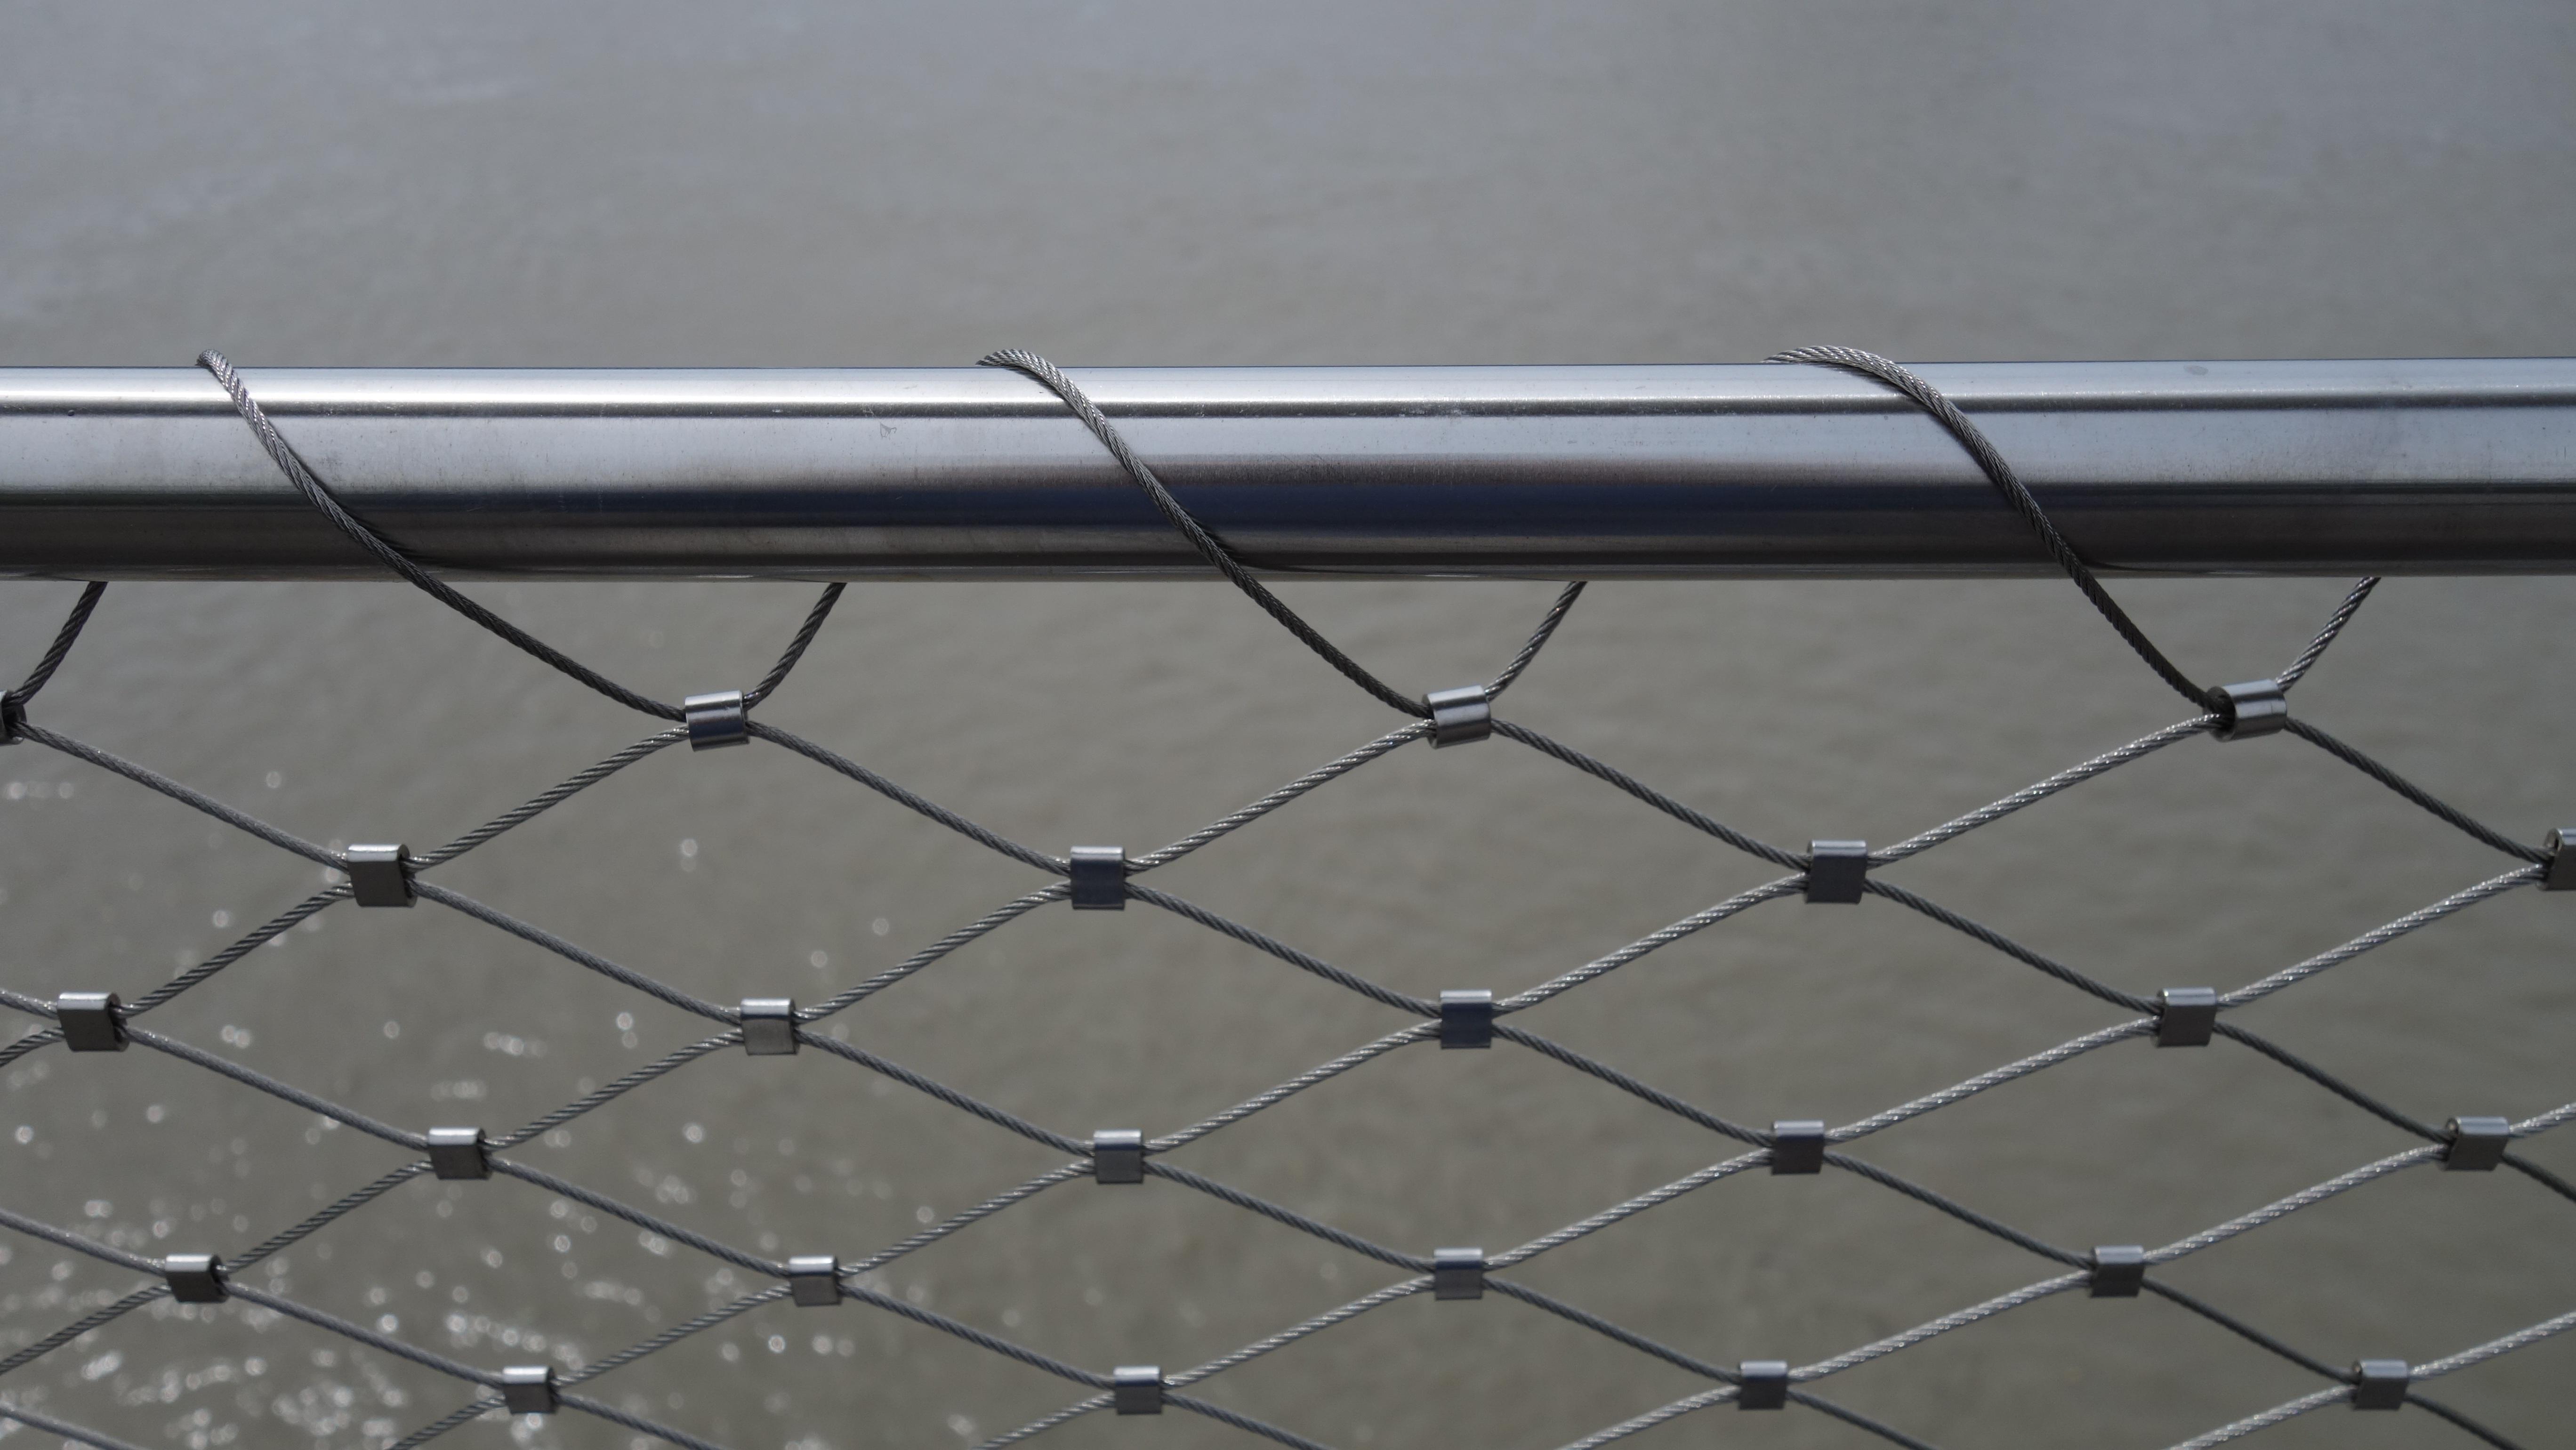 Kostenlose foto : Flügel, Zaun, Technologie, Tube, Stock, Draht ...